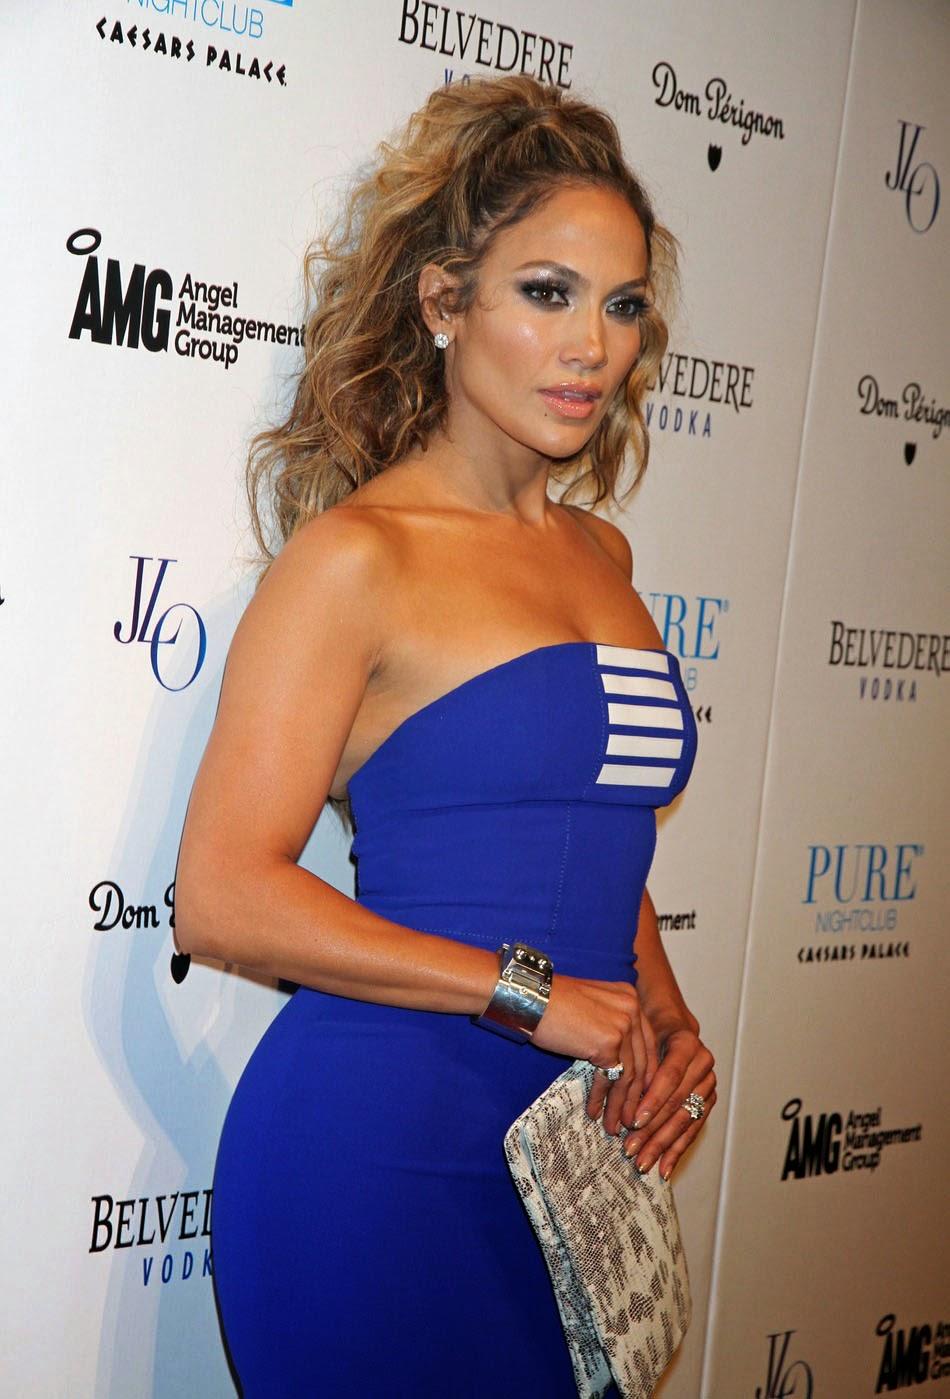 Hot+Jennifer+Lopez+Body+Pics+Pics001